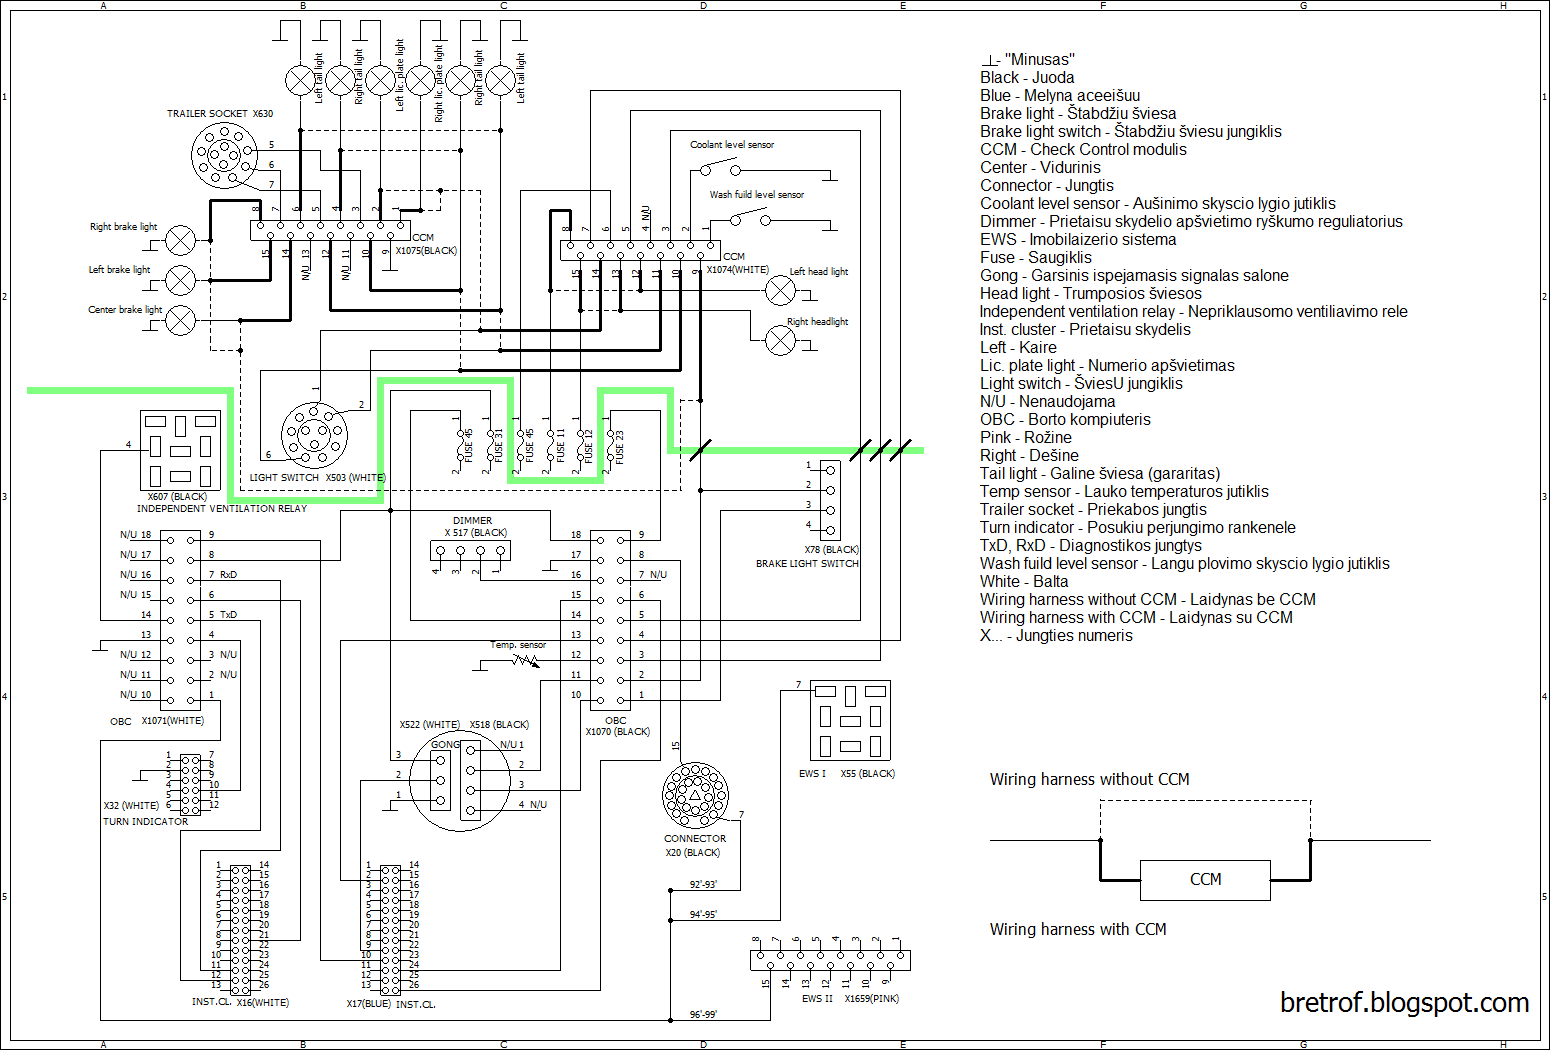 Bmw E36 Obc Wiring Diagram - DIY Wiring Diagrams •